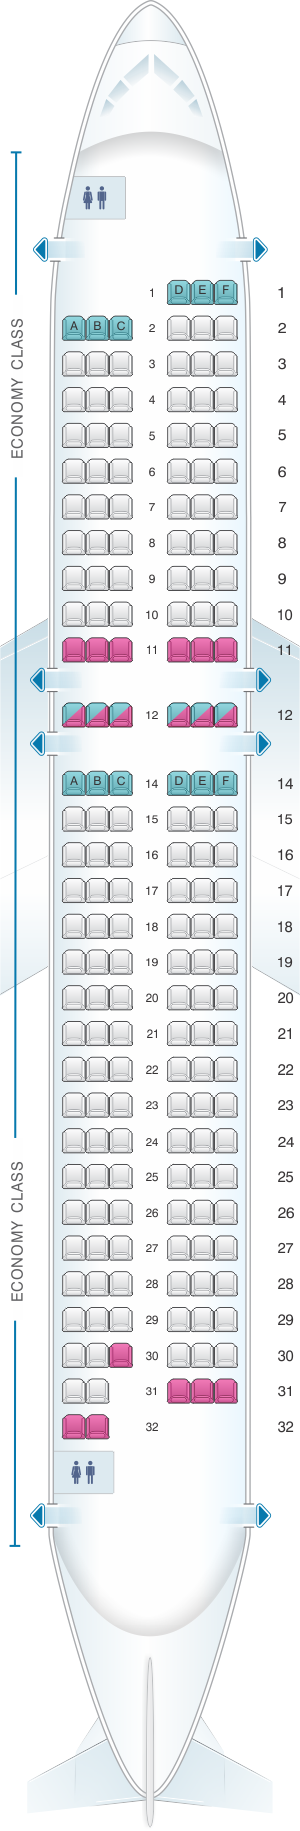 Seat map for Air France Airbus A320 Metropolitan V3